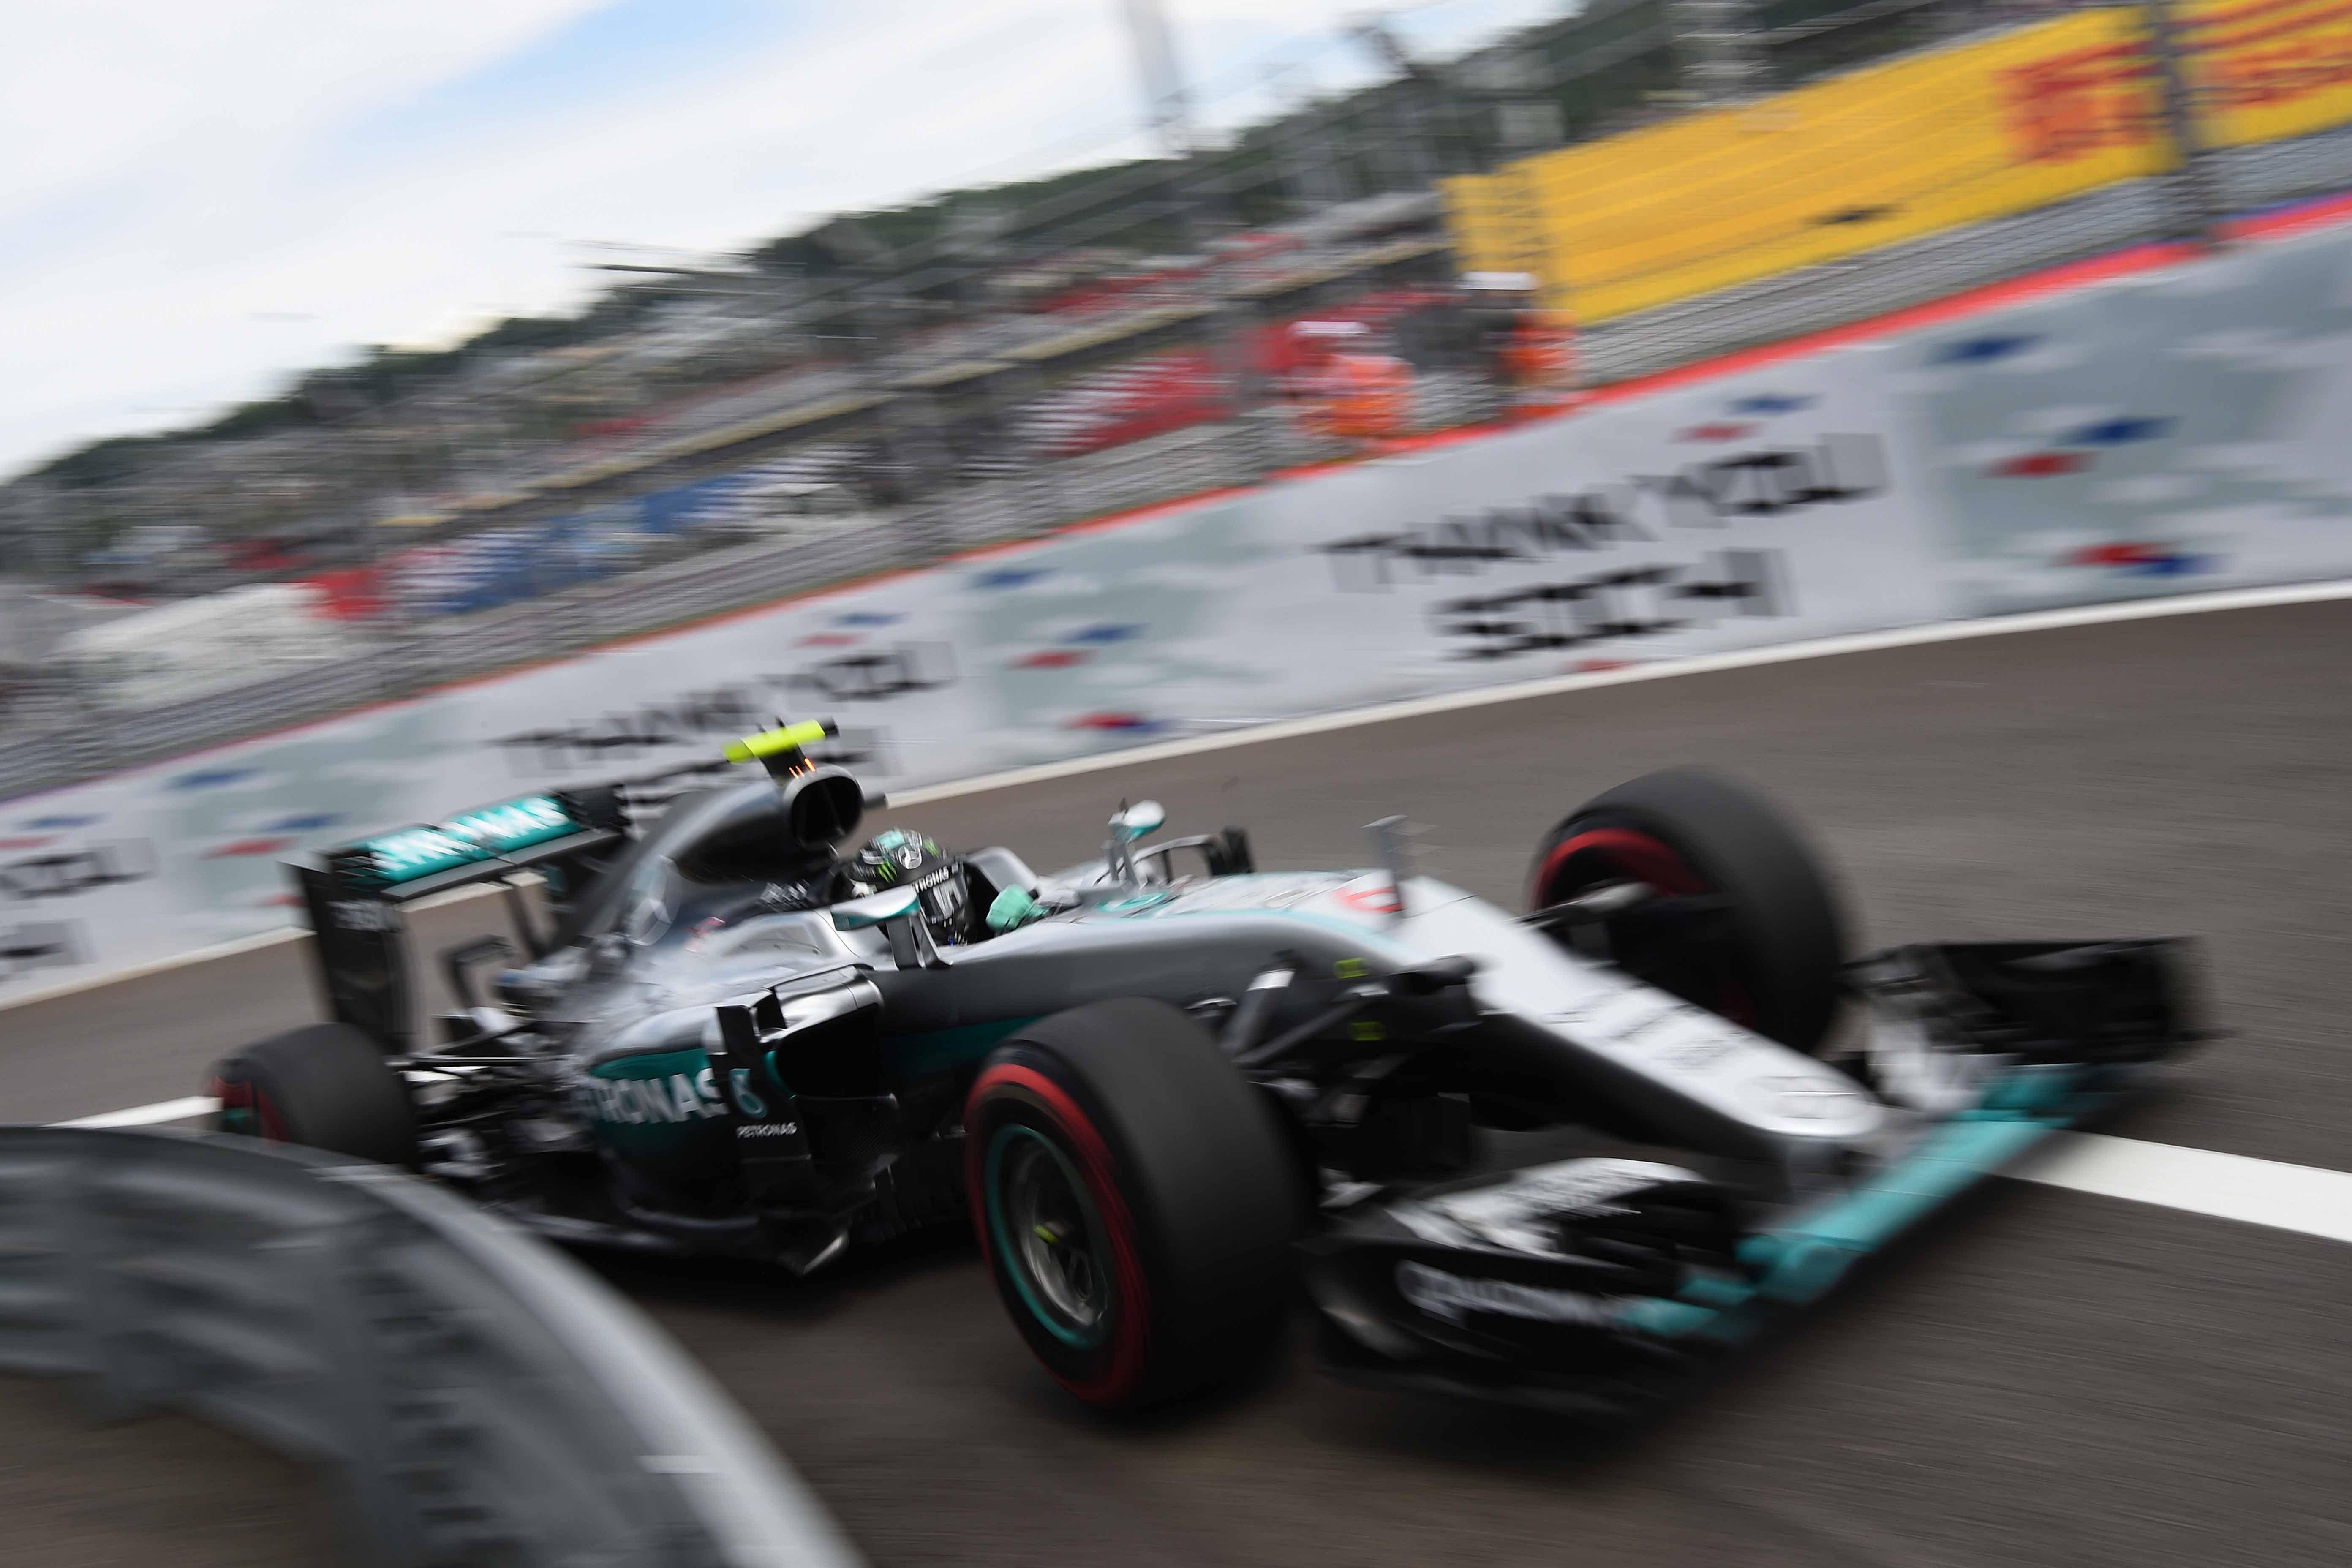 F1 - Rosberg en pole dans un fauteuil � Sotchi